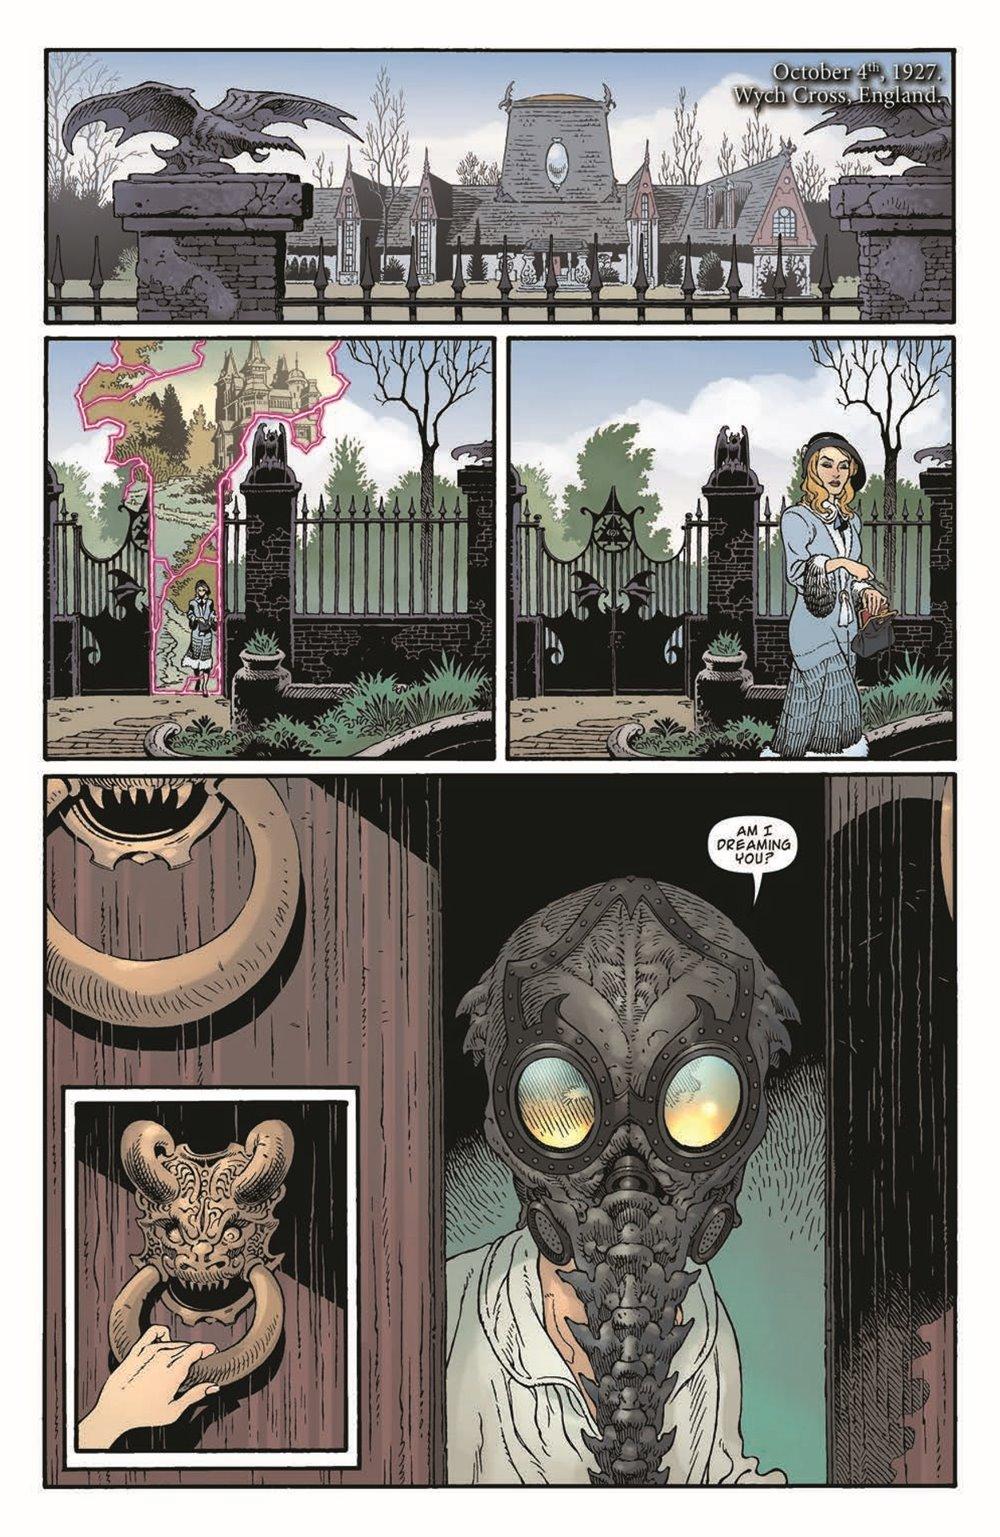 LnK-Sandman01_pr-6 ComicList Previews: LOCKE AND KEY THE SANDMAN UNIVERSE HELL AND GONE #1